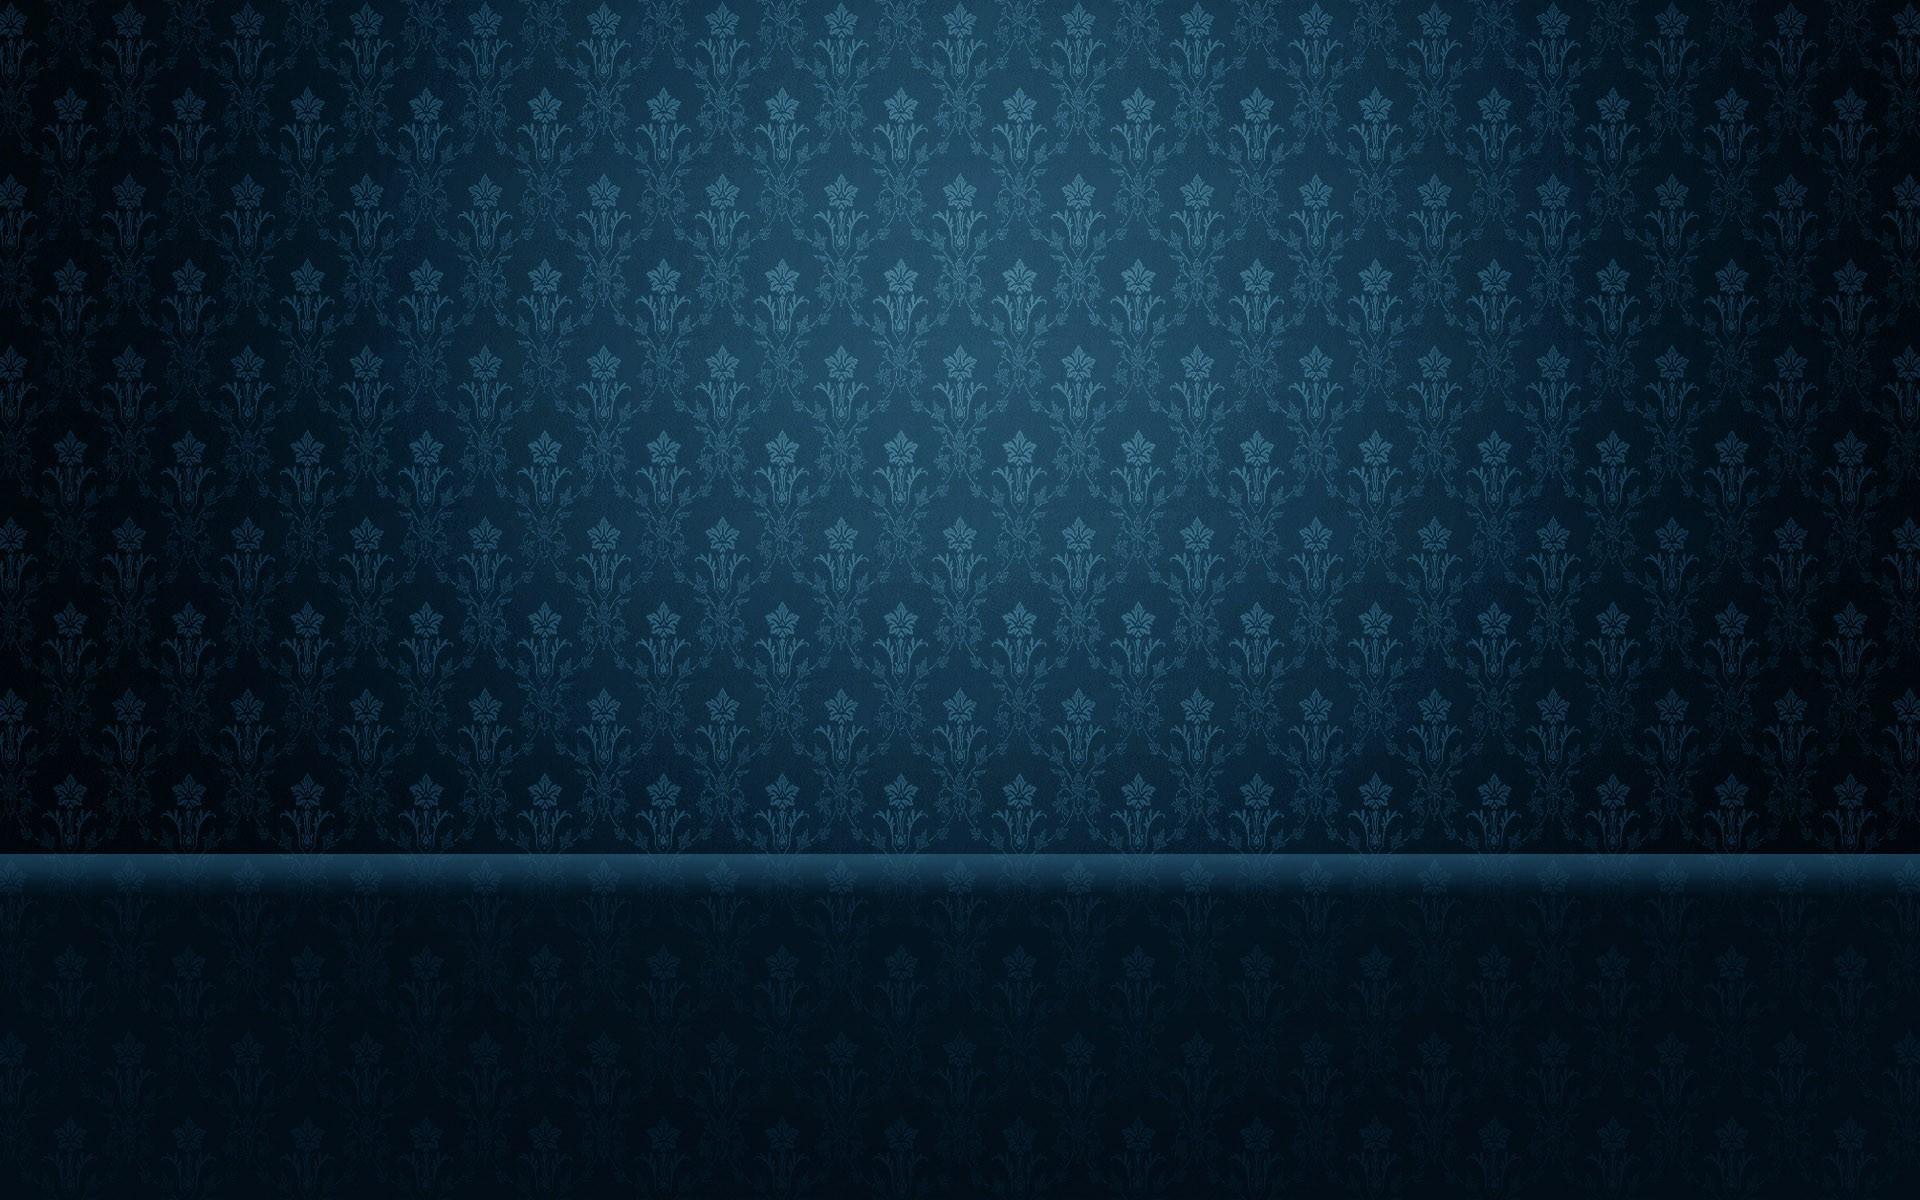 Blue vintage pattern wallpaper 15196 1920x1200